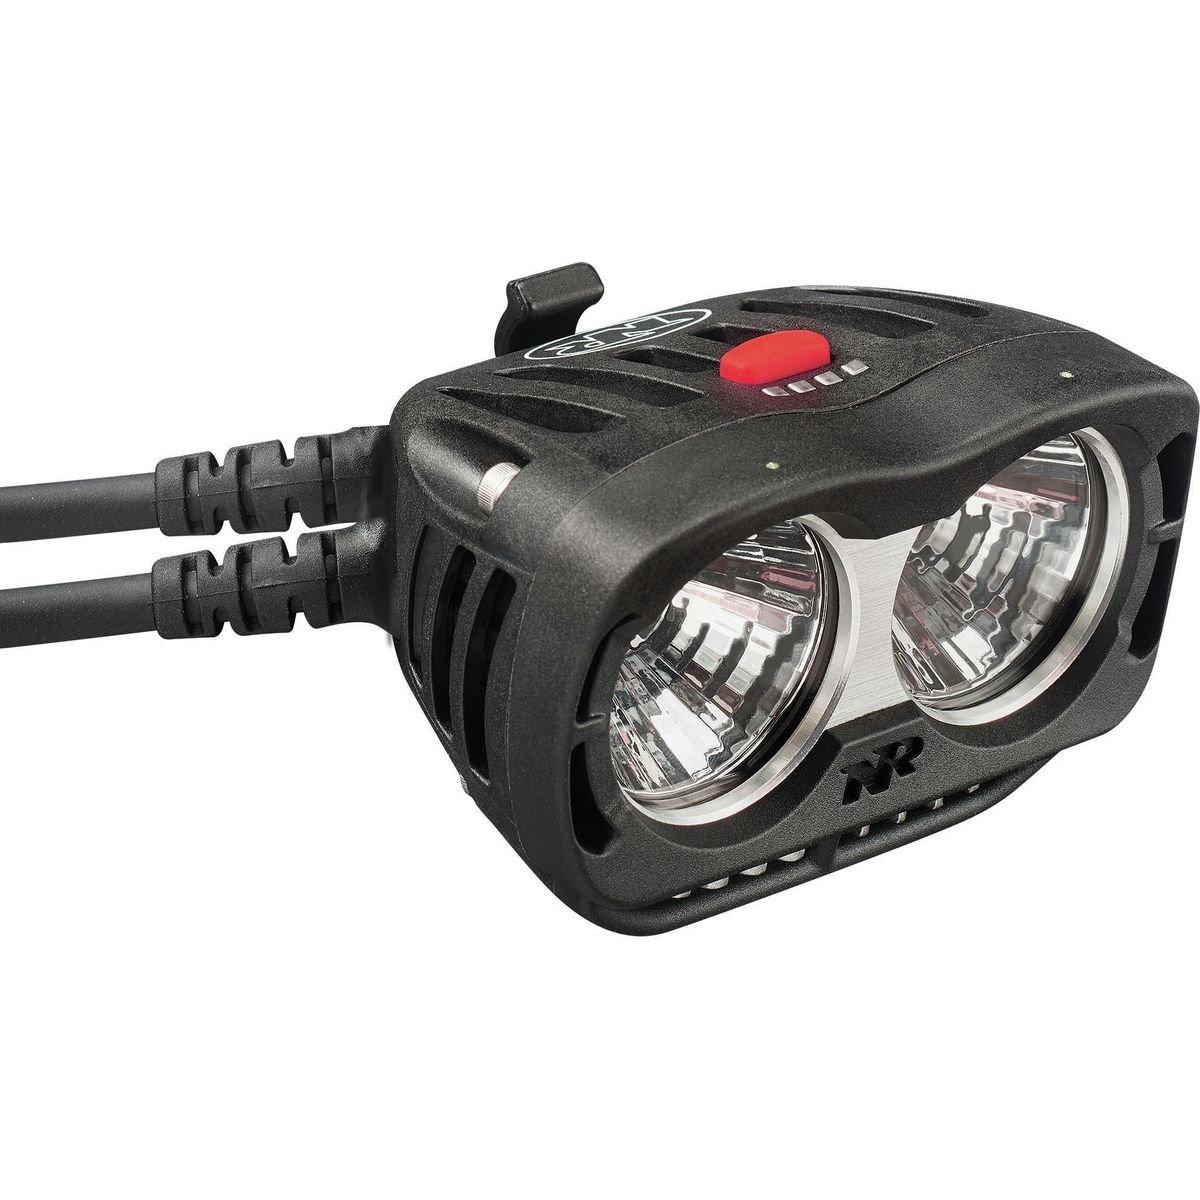 NiteRider Pro 2800 Enduro Remote Black, One Size